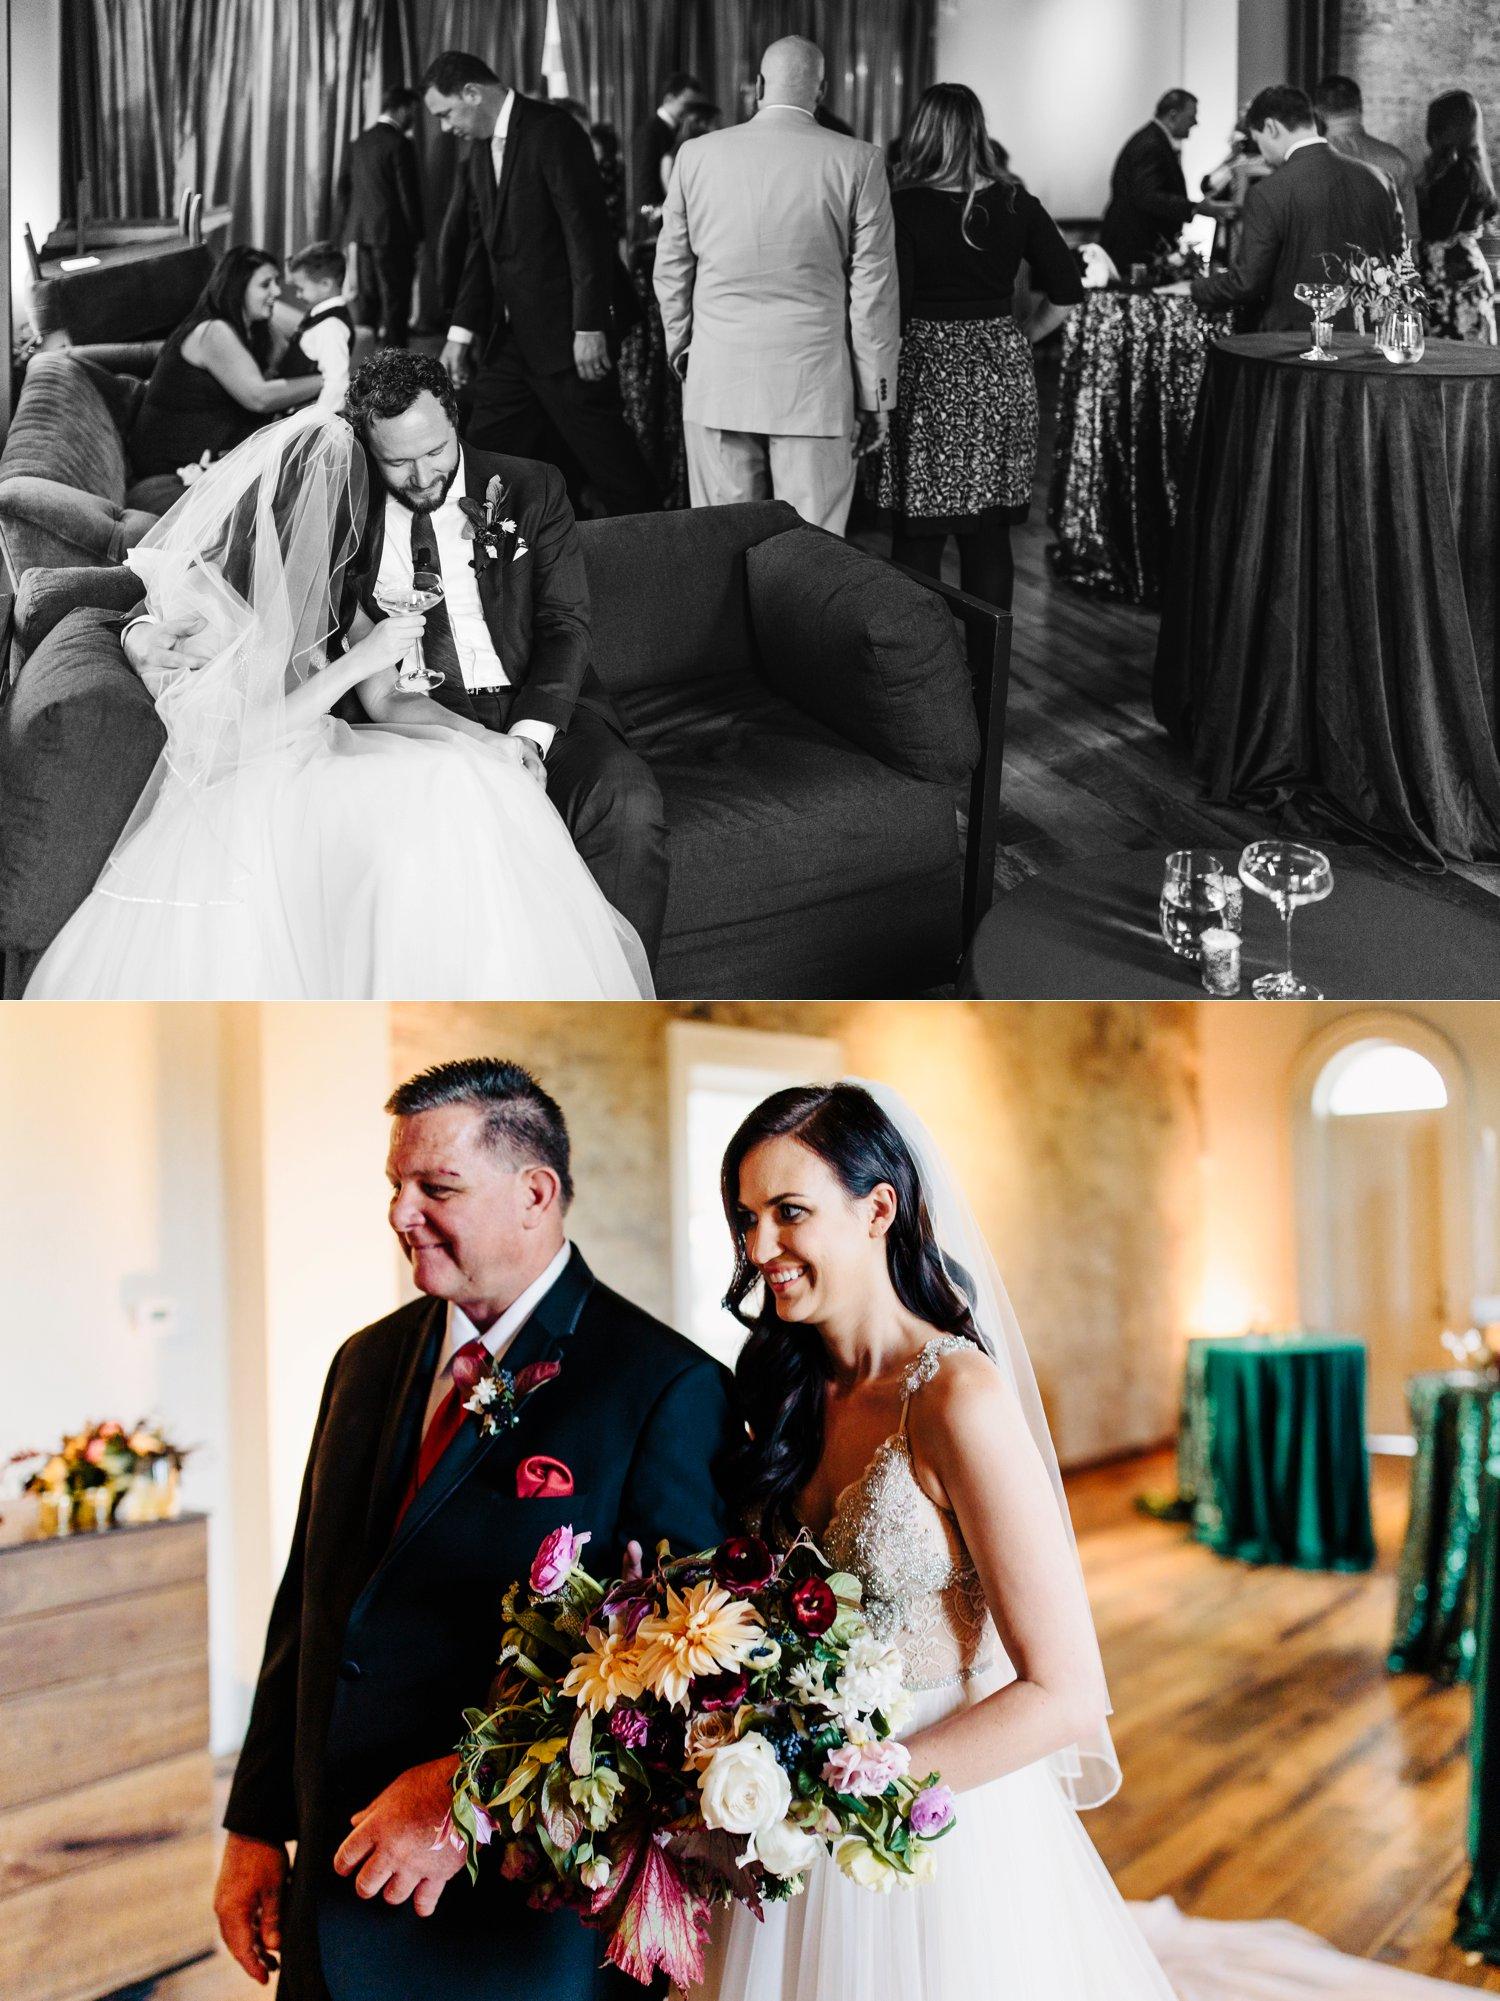 CK-Photo-Nashville-engagement-wedding-photographer-the-cordelle_0023.jpg